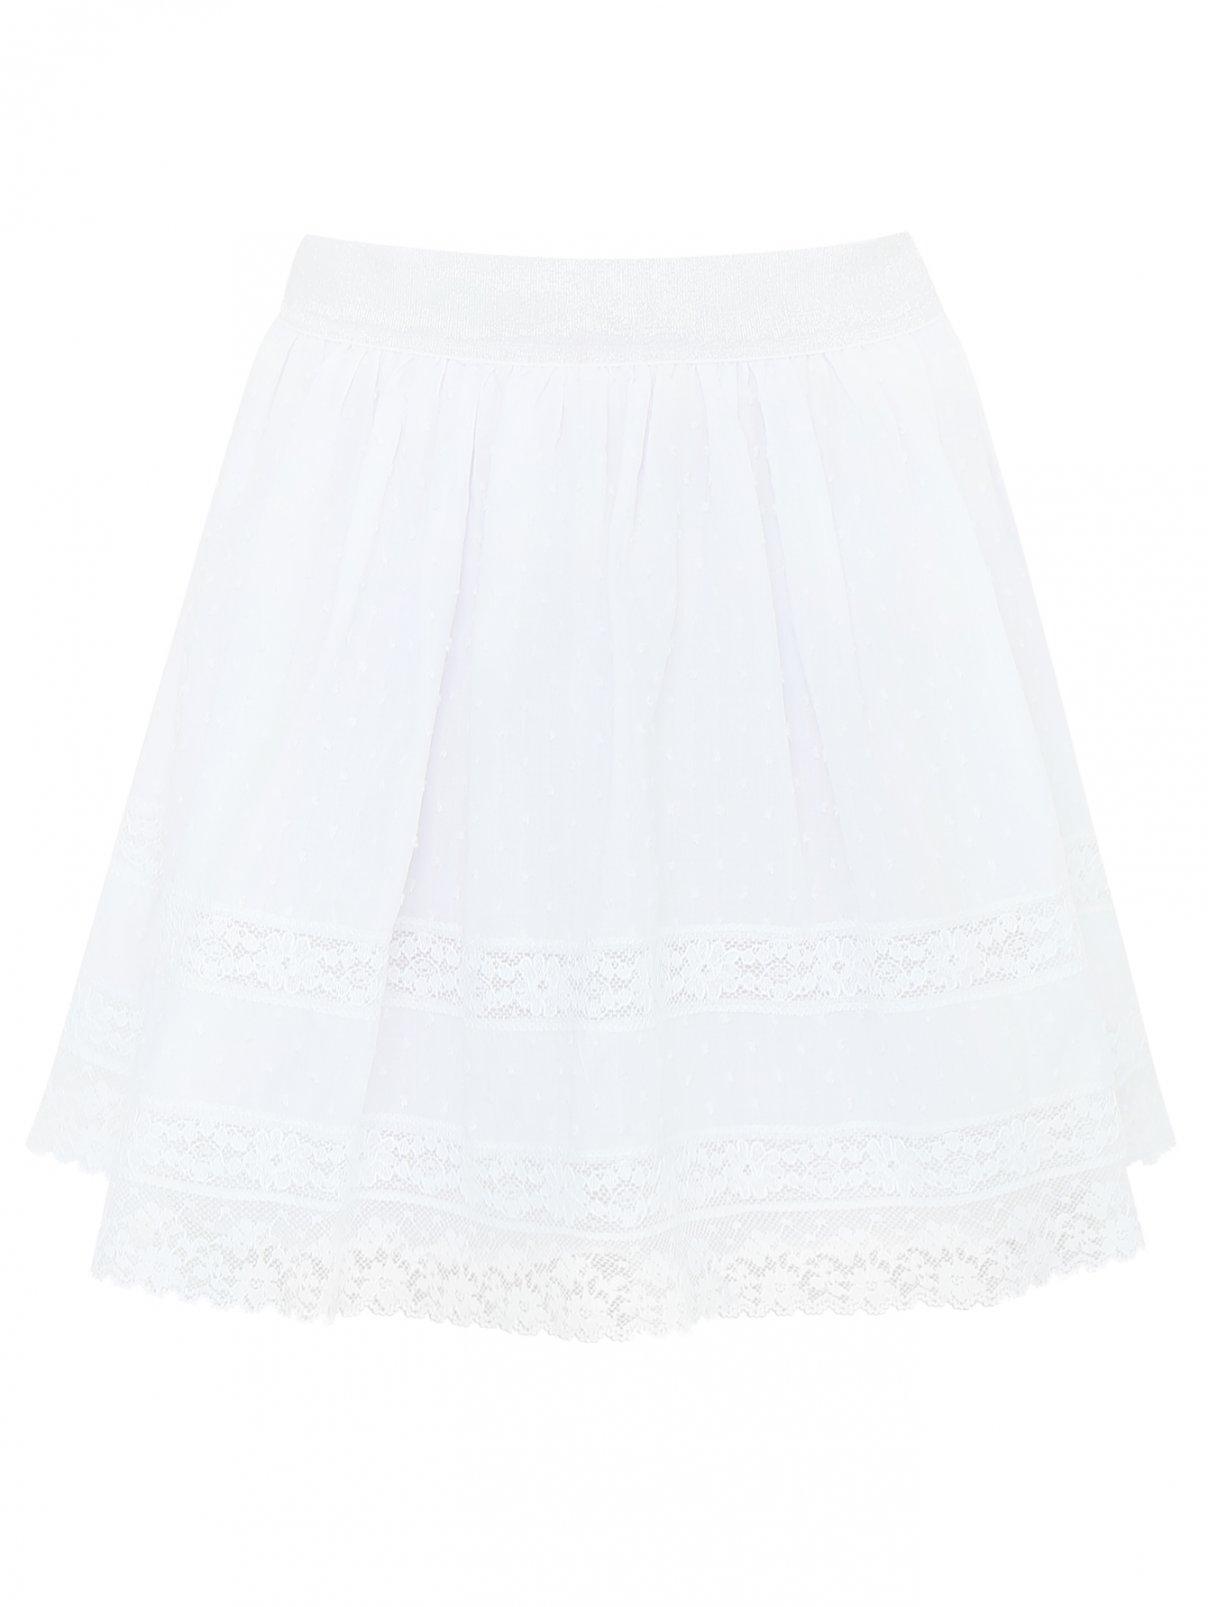 Юбка из фактурного хлопка на резинке Aletta Couture  –  Общий вид